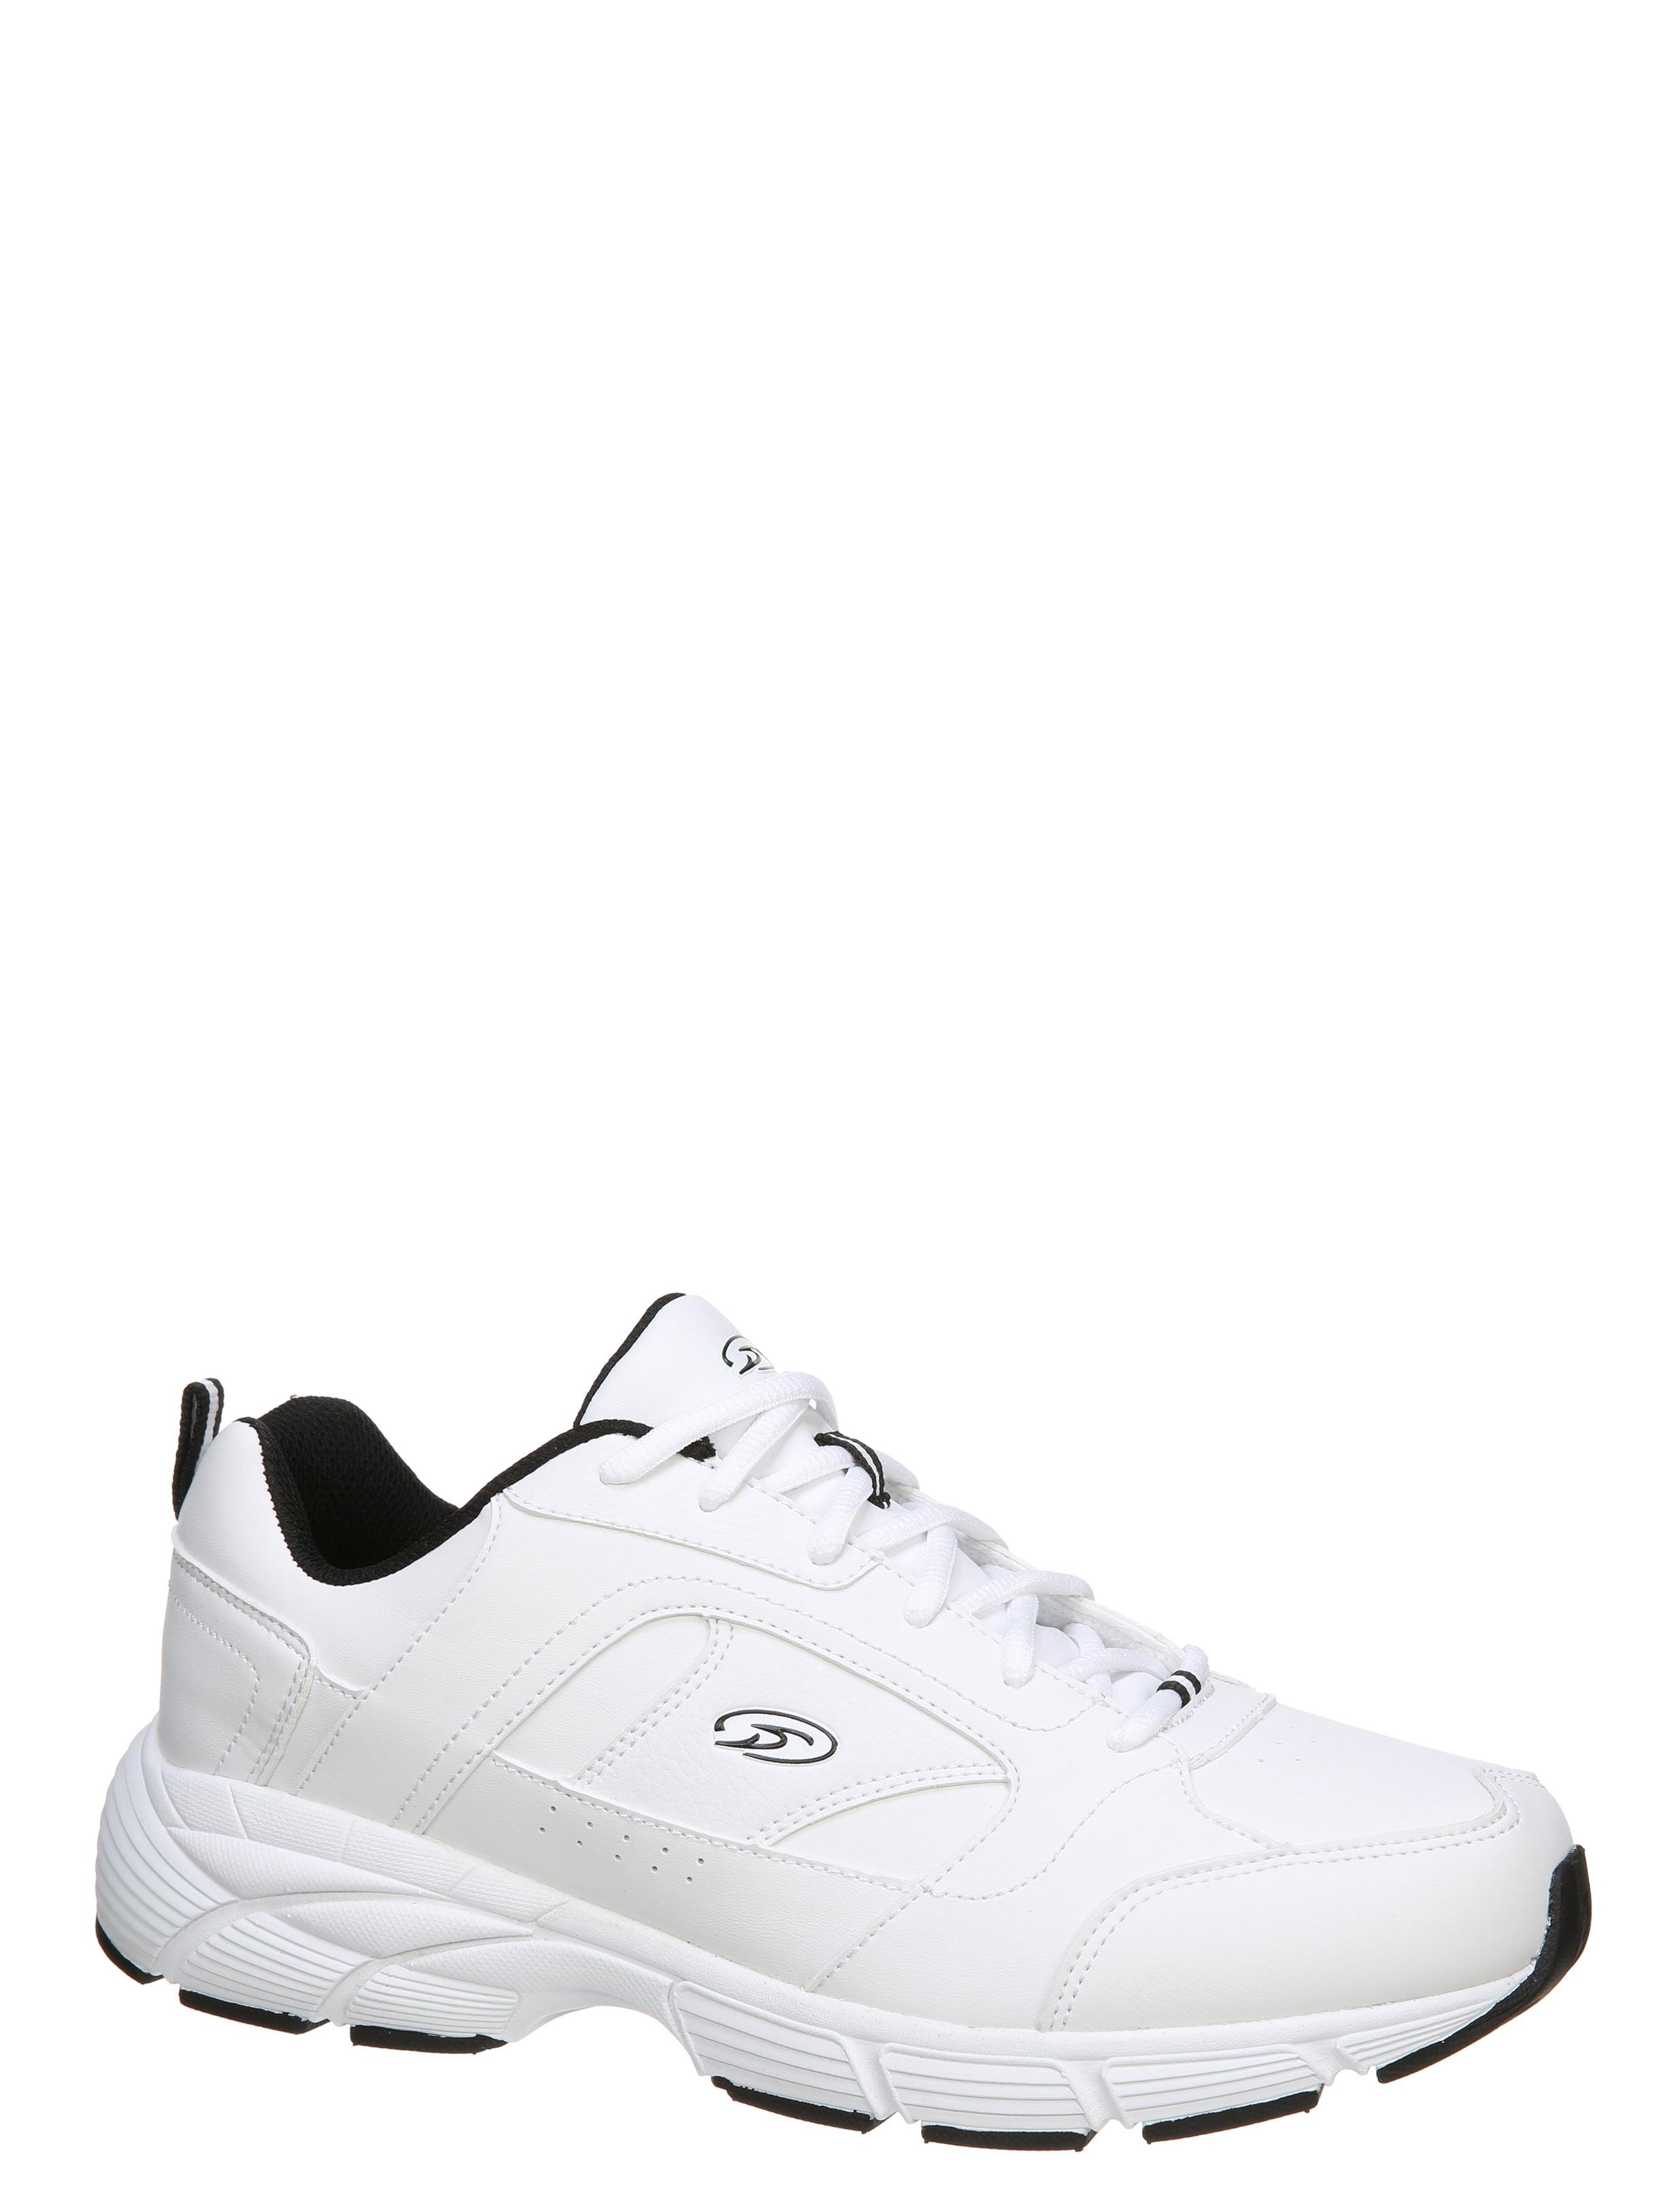 Dr. Scholl's Men's Athletic Warum Shoe